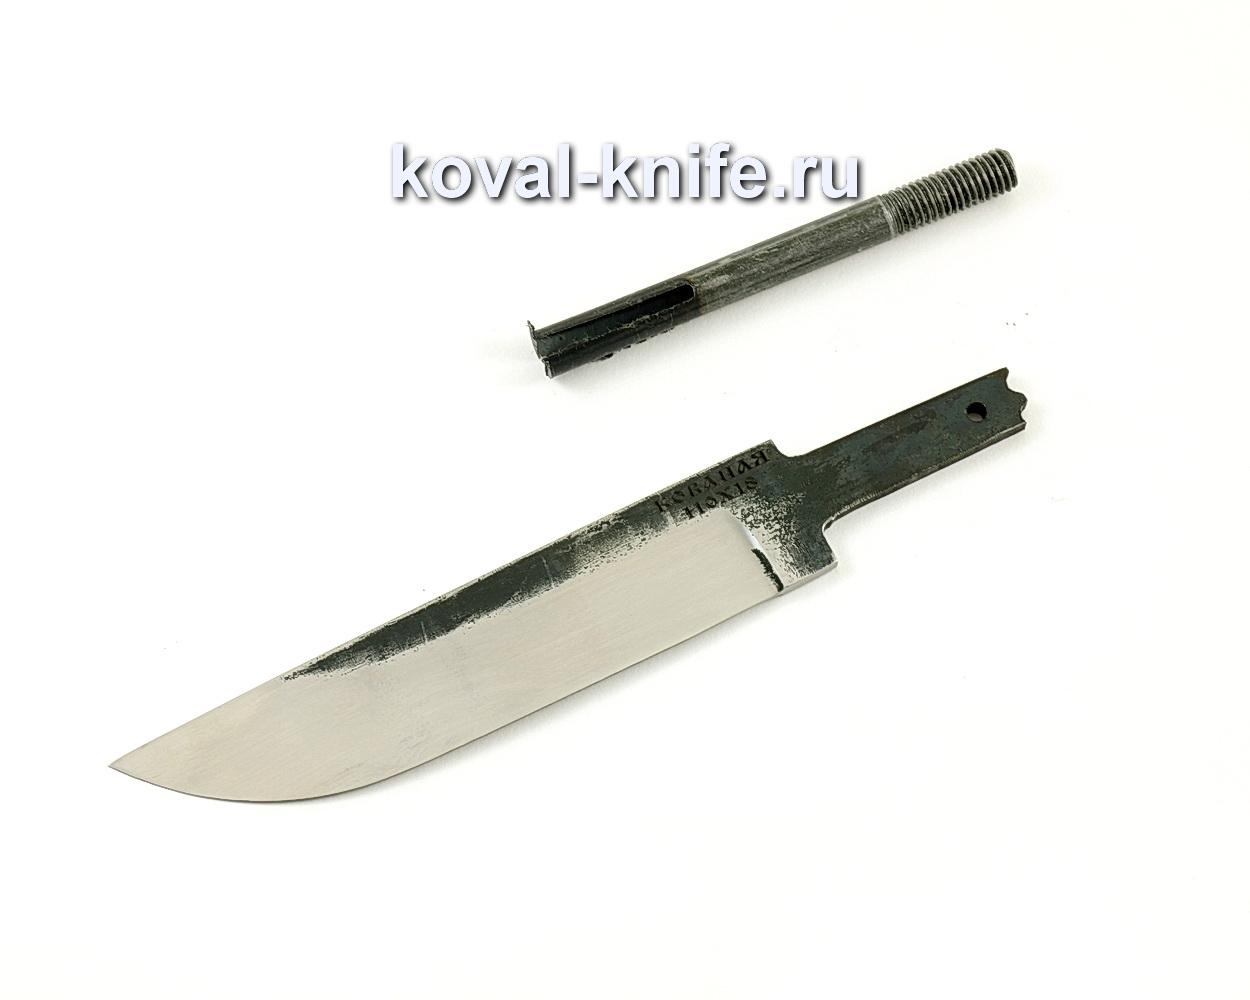 Клинок для ножа Белка (кованая сталь 110Х18 МШД)